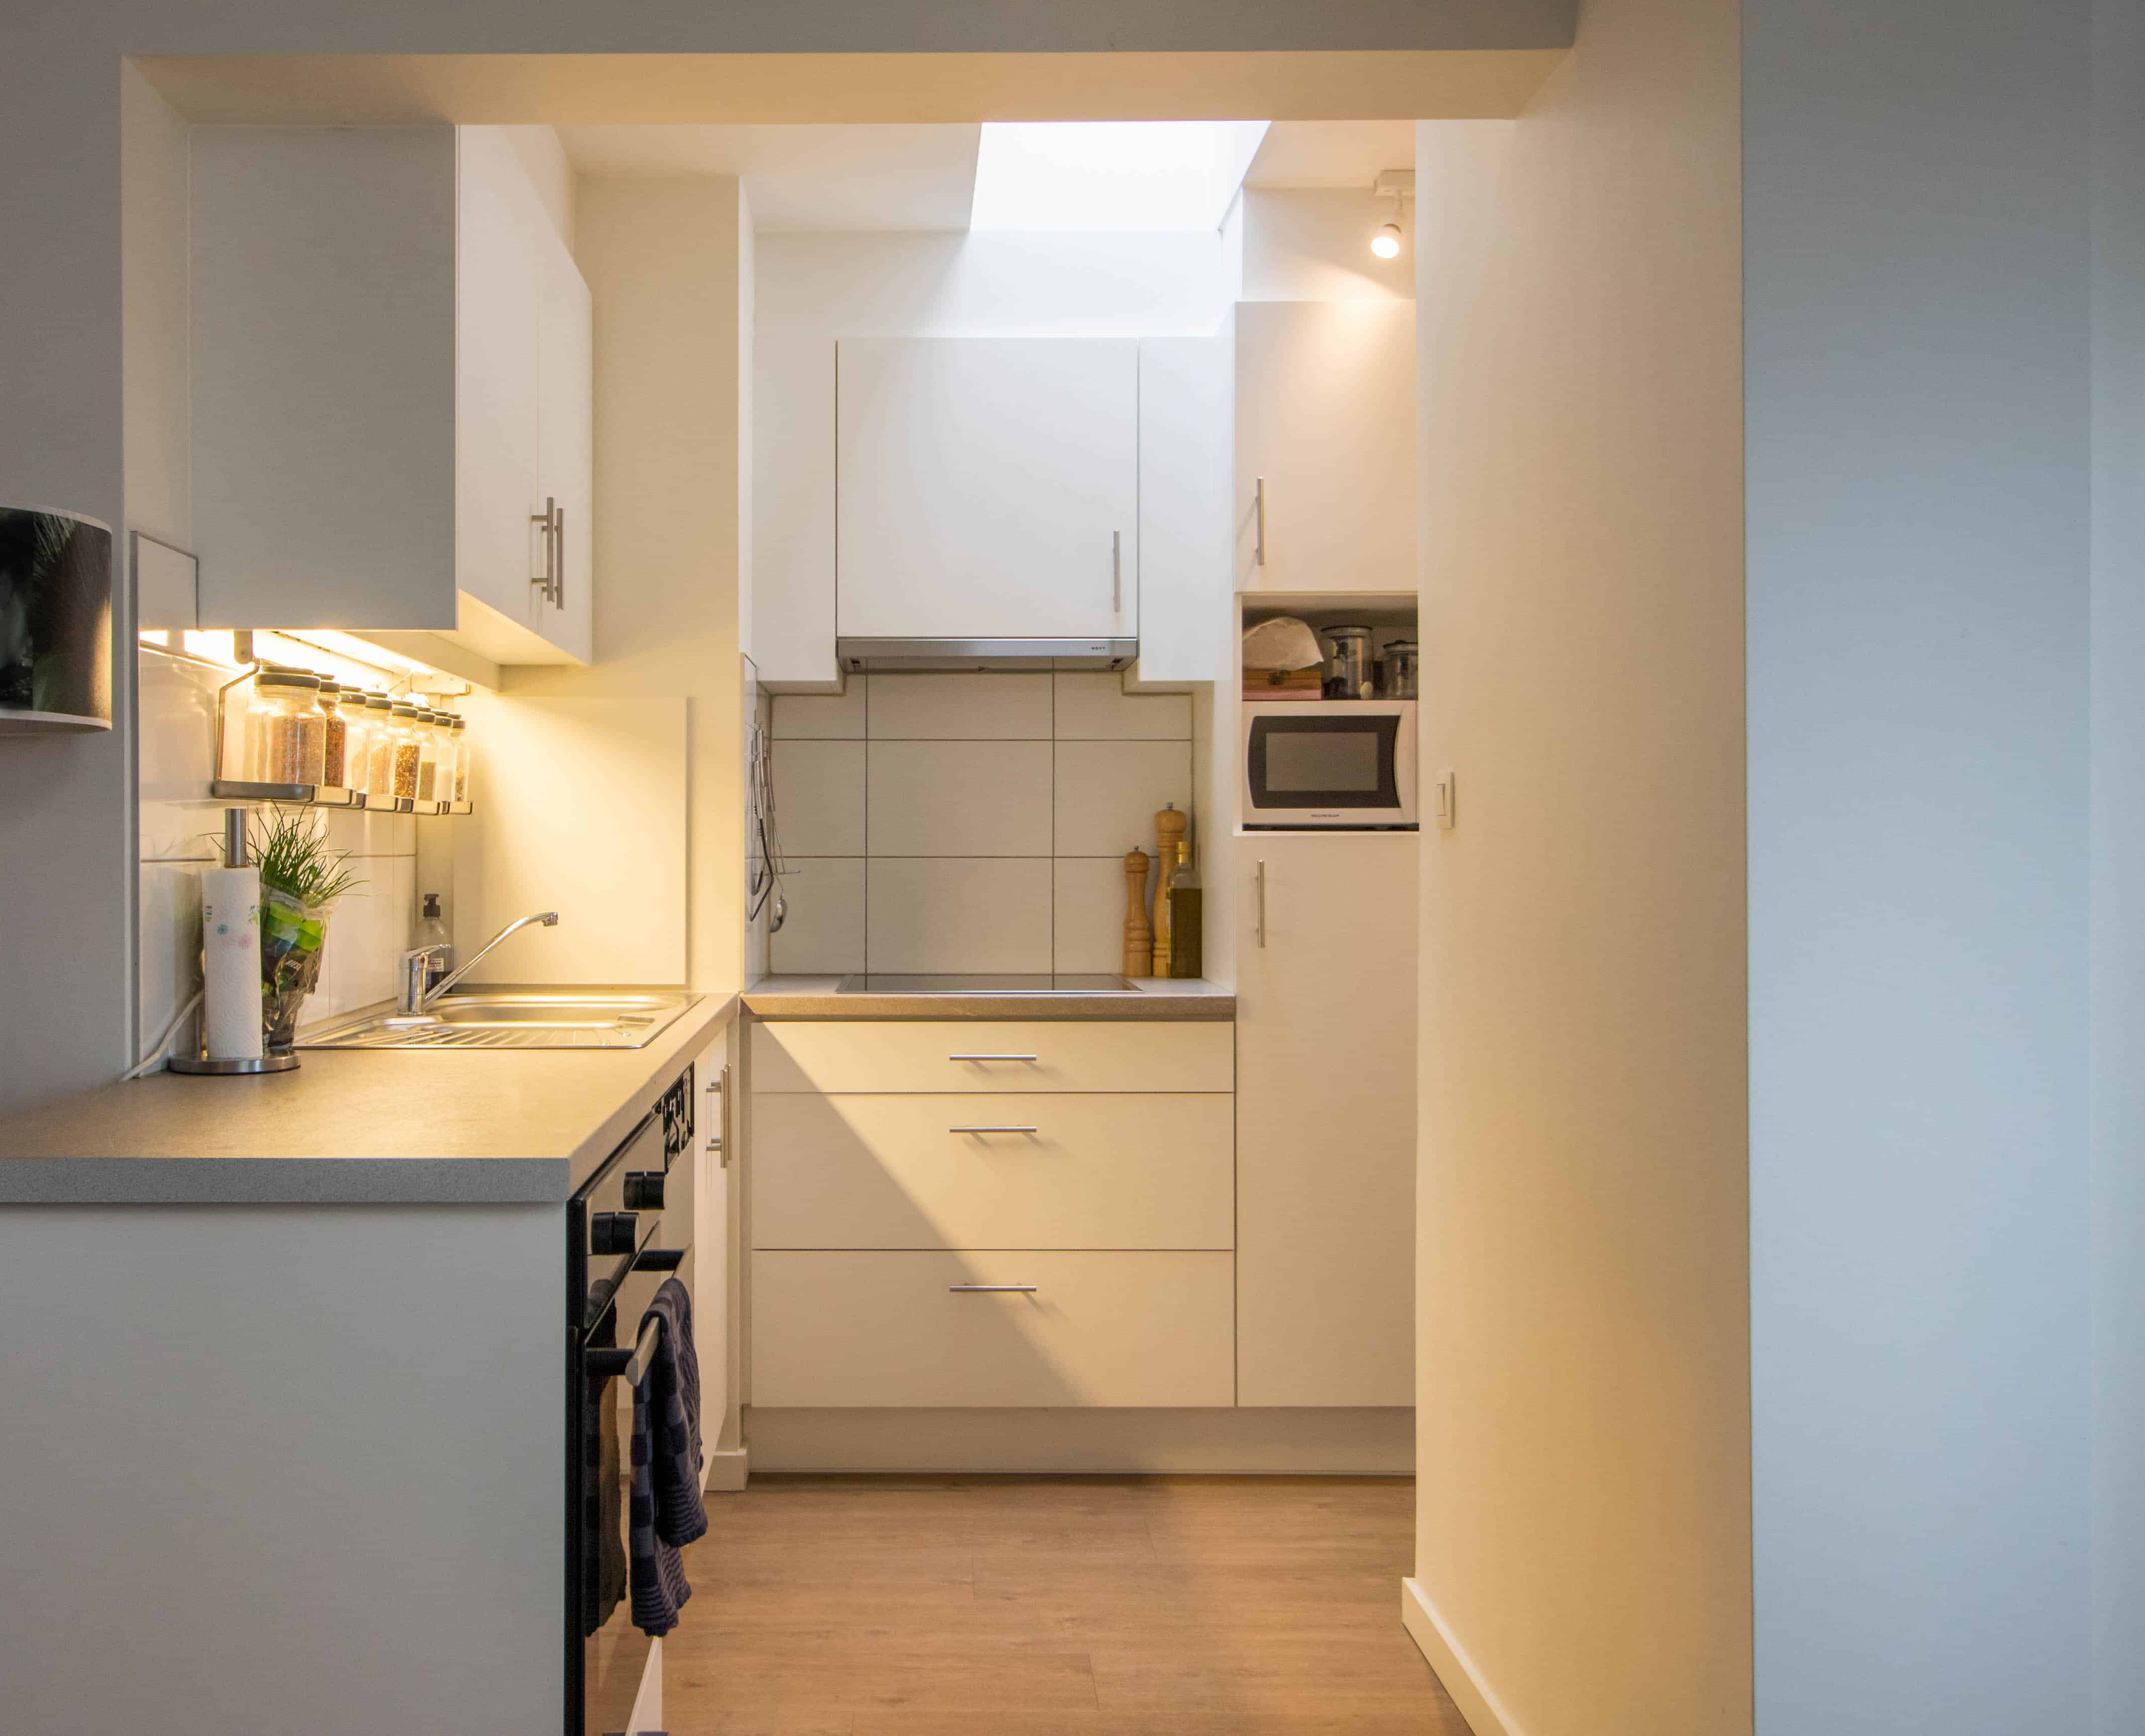 Keuken woning in Hasselt